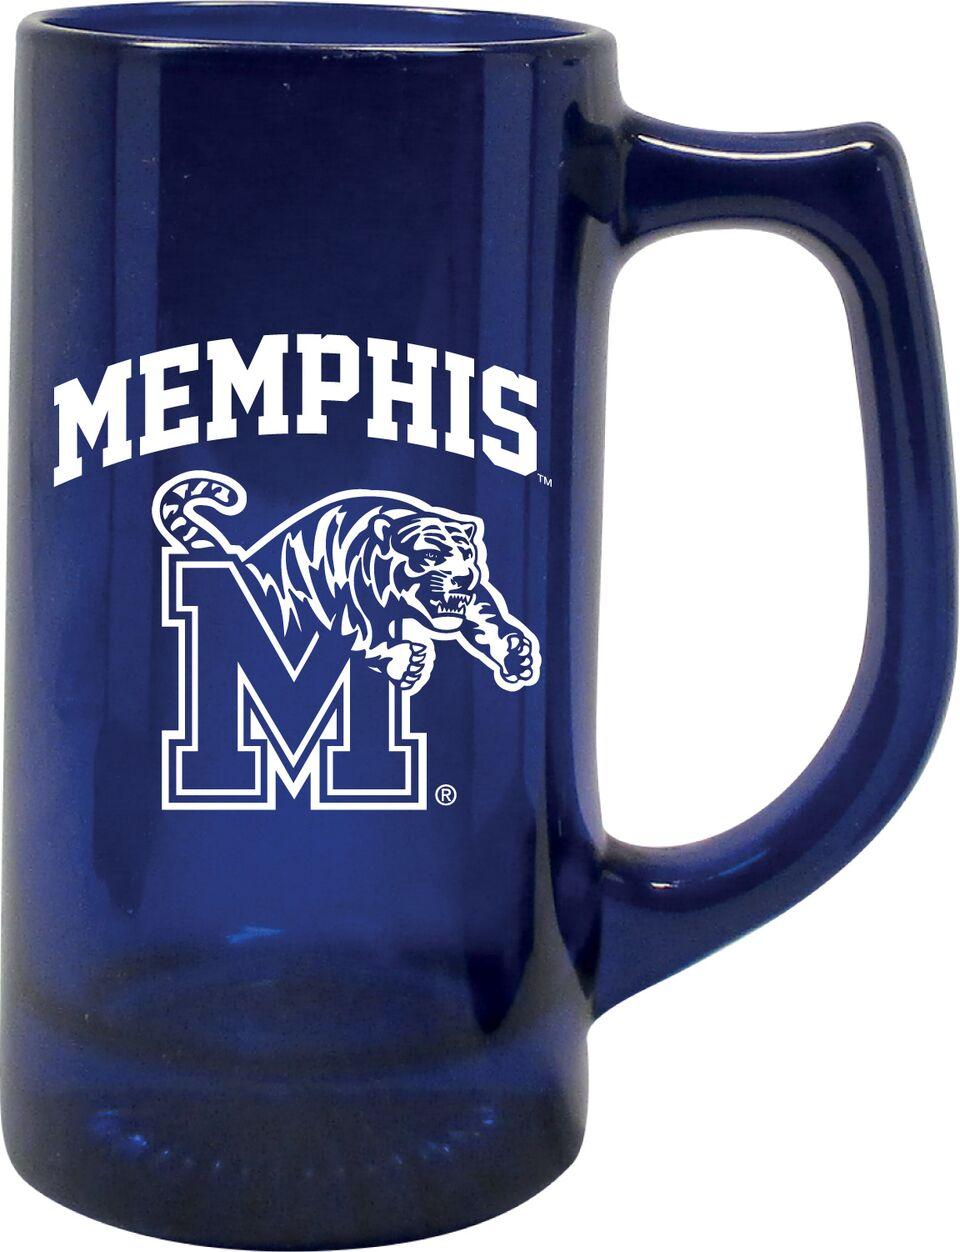 Blue Sport Beer Mug